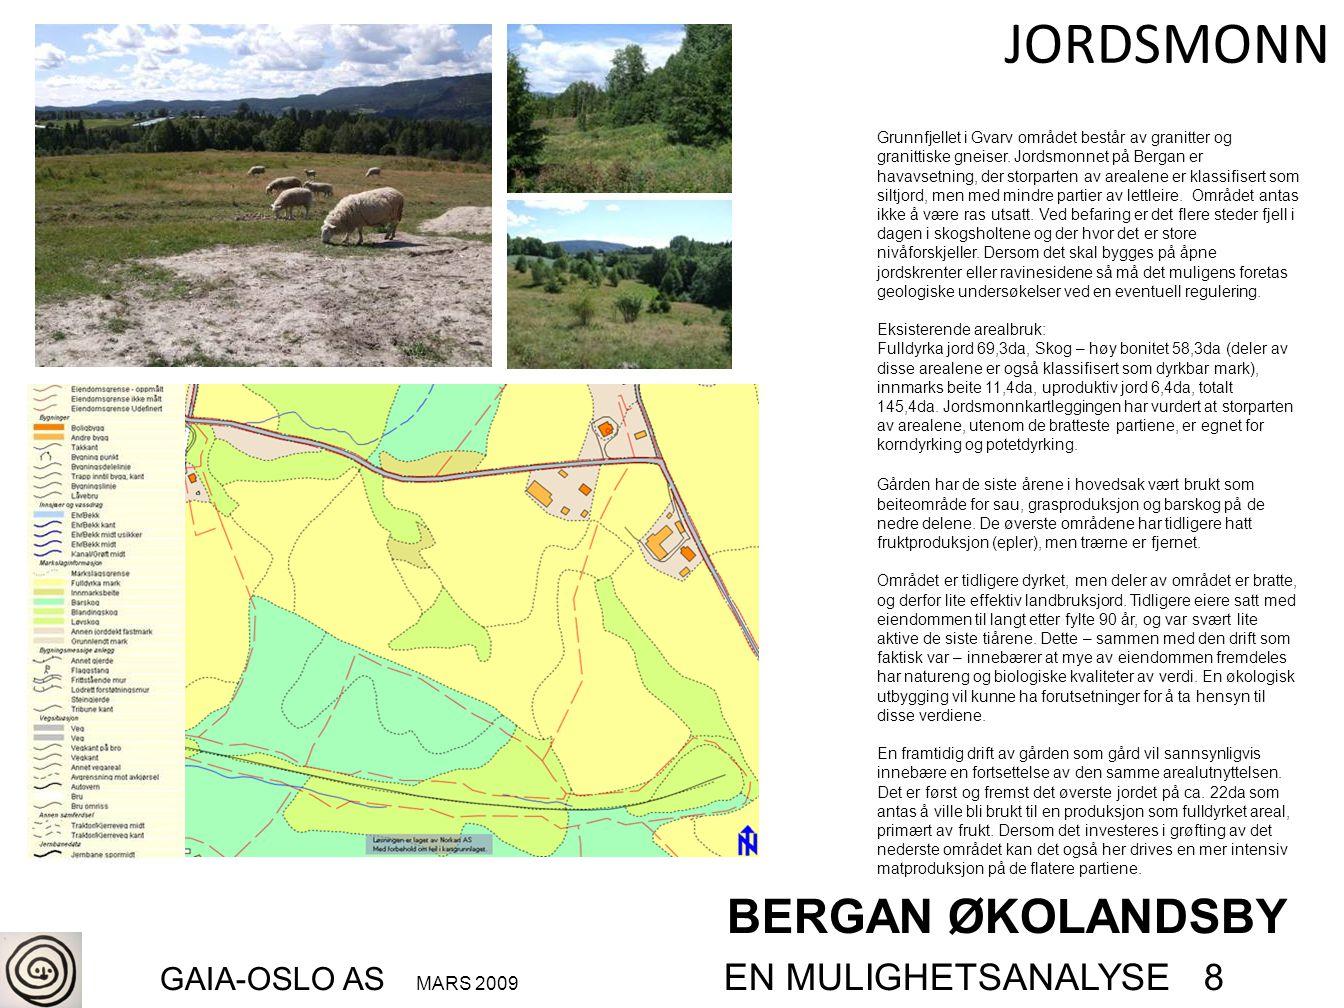 BERGAN ØKOLANDSBY GAIA-OSLO AS MARS 2009 EN MULIGHETSANALYSE 8